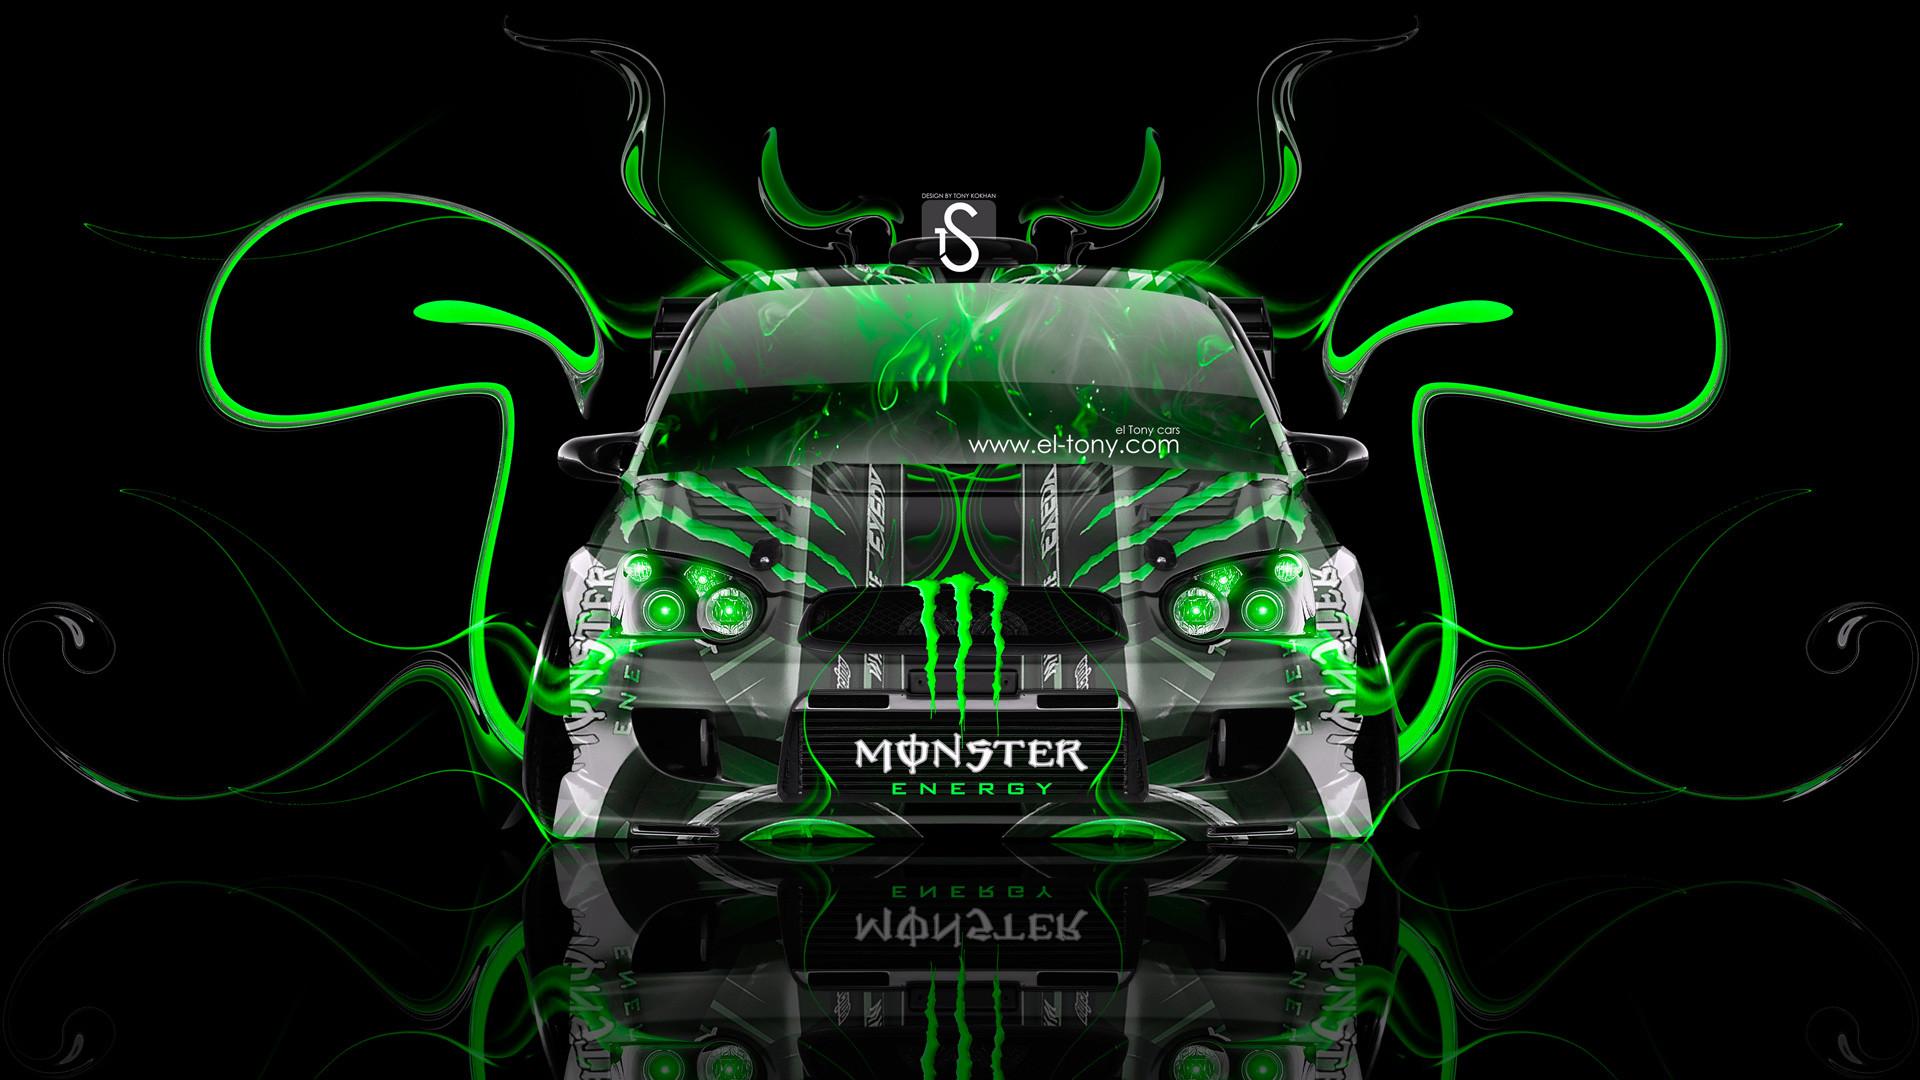 Monster-Energy-Subaru-Impreza-WRX-STI-JDM-Green-